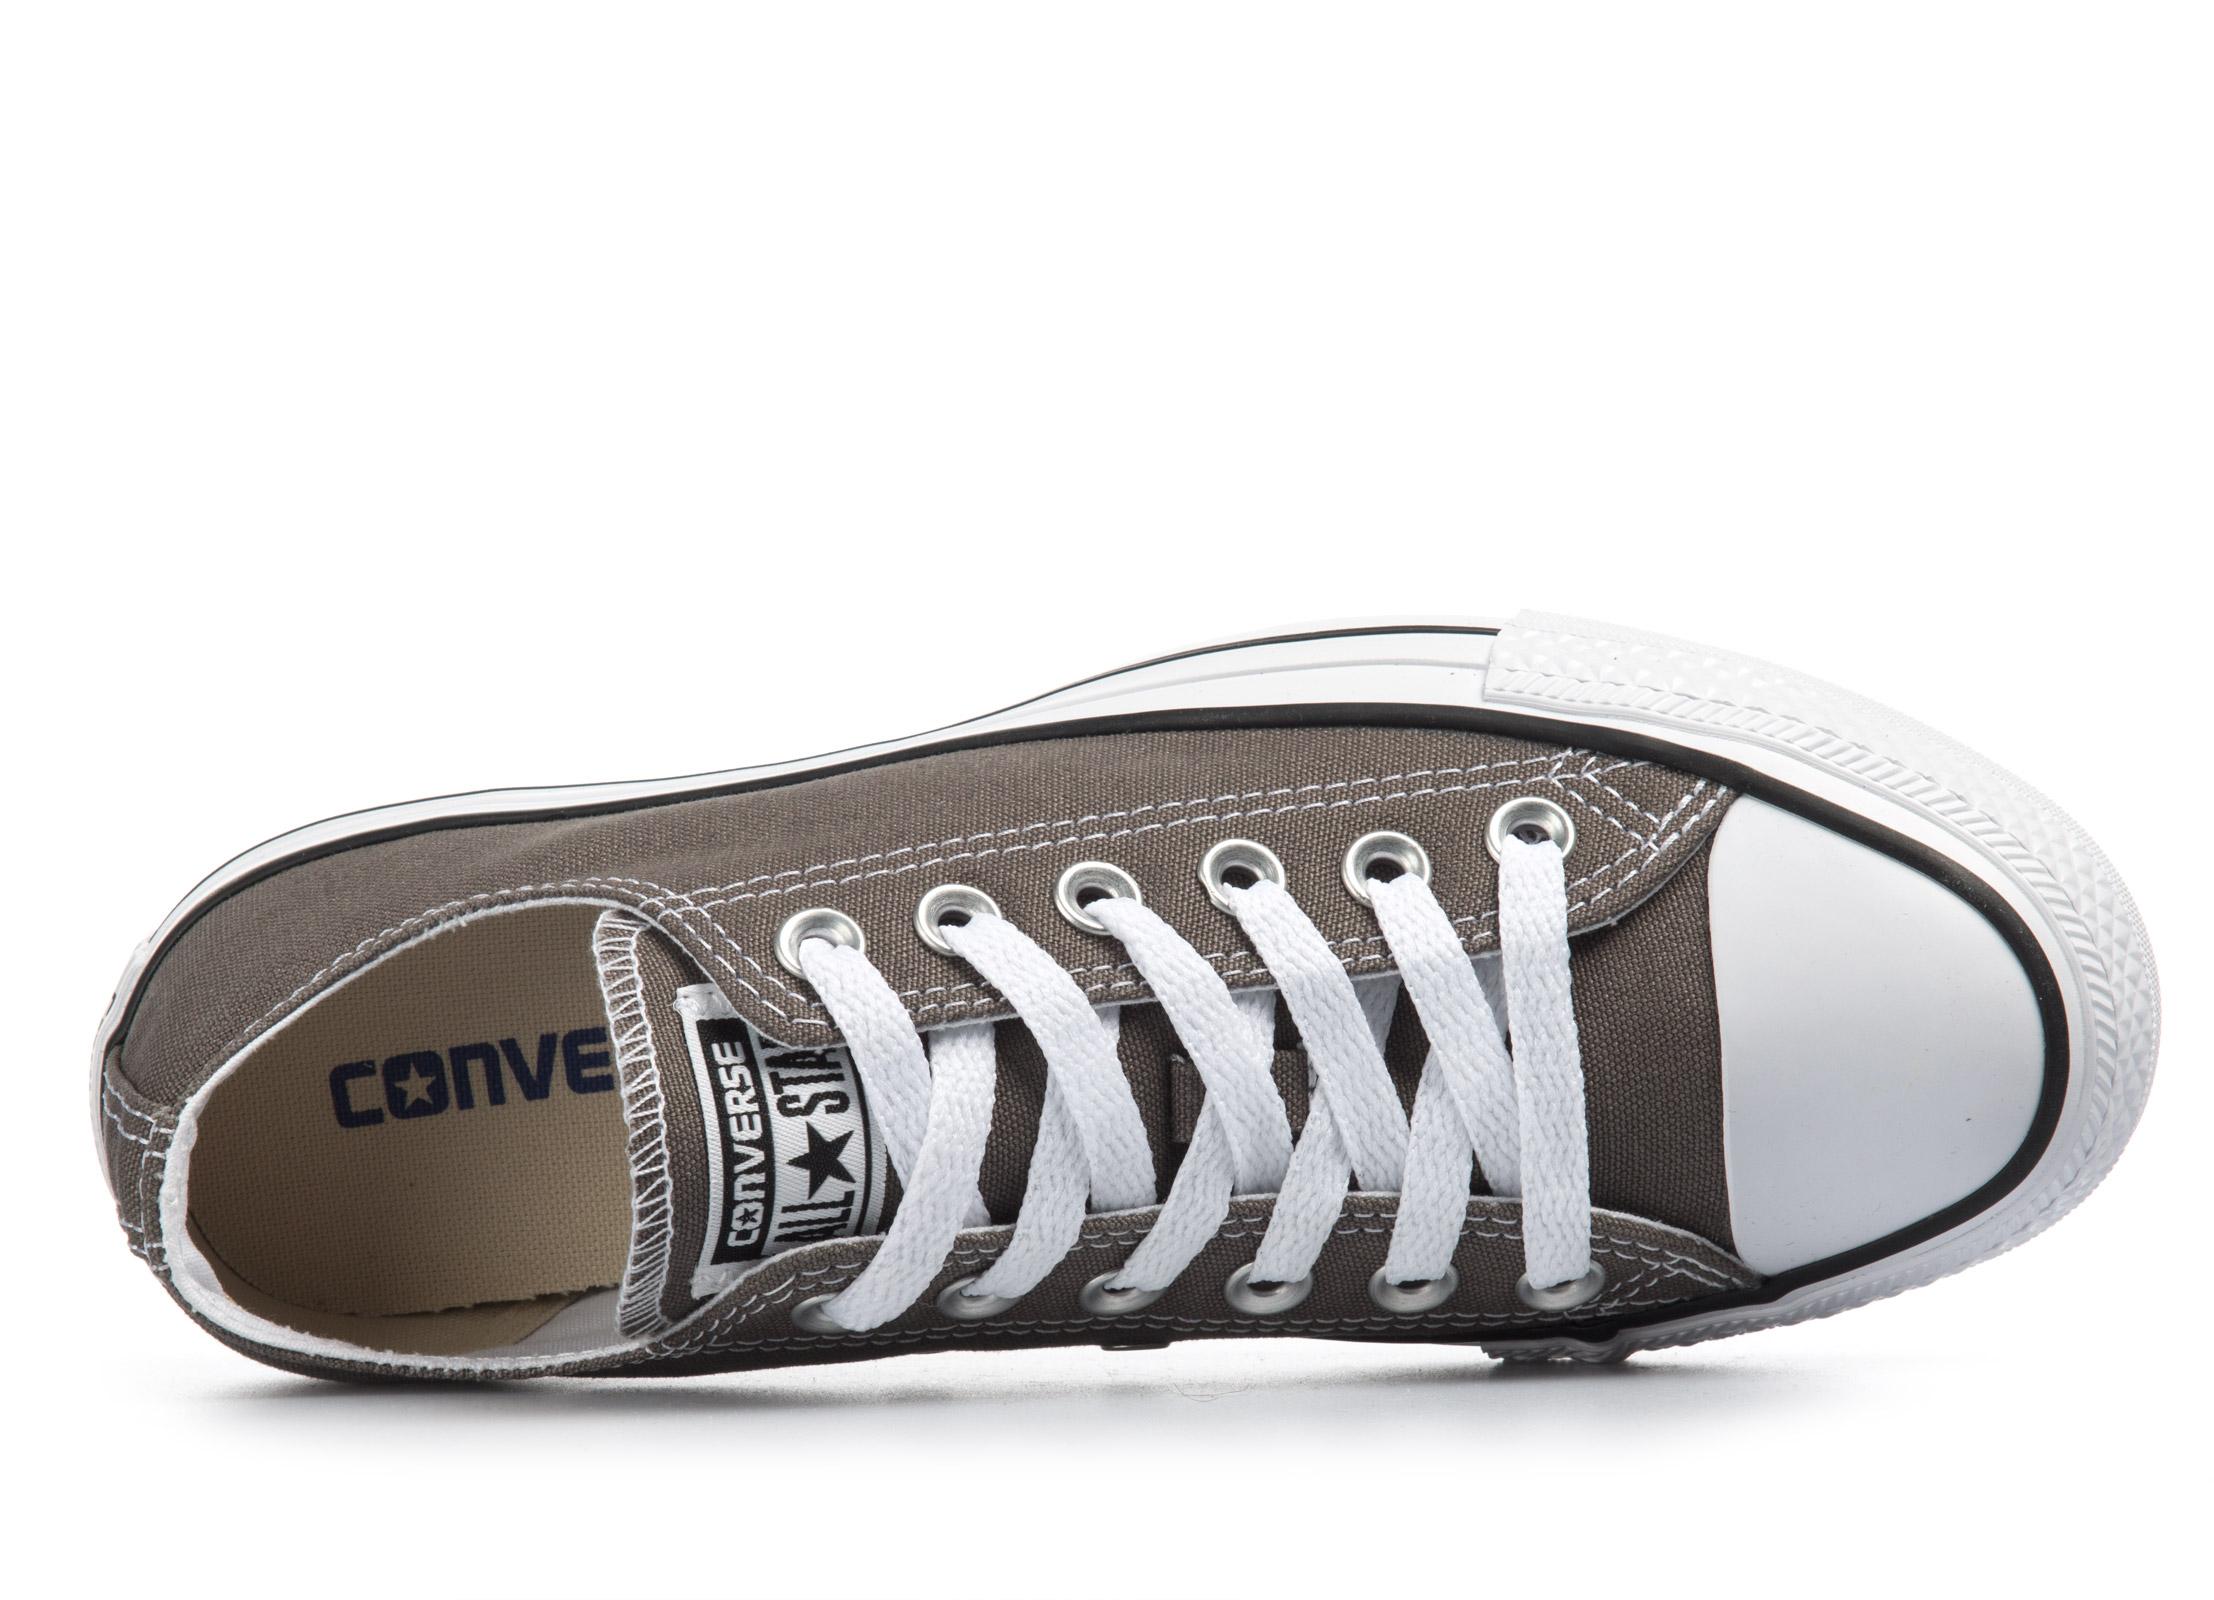 Converse Chuck Taylor All Star Ox 1J794C Ανθρακί.